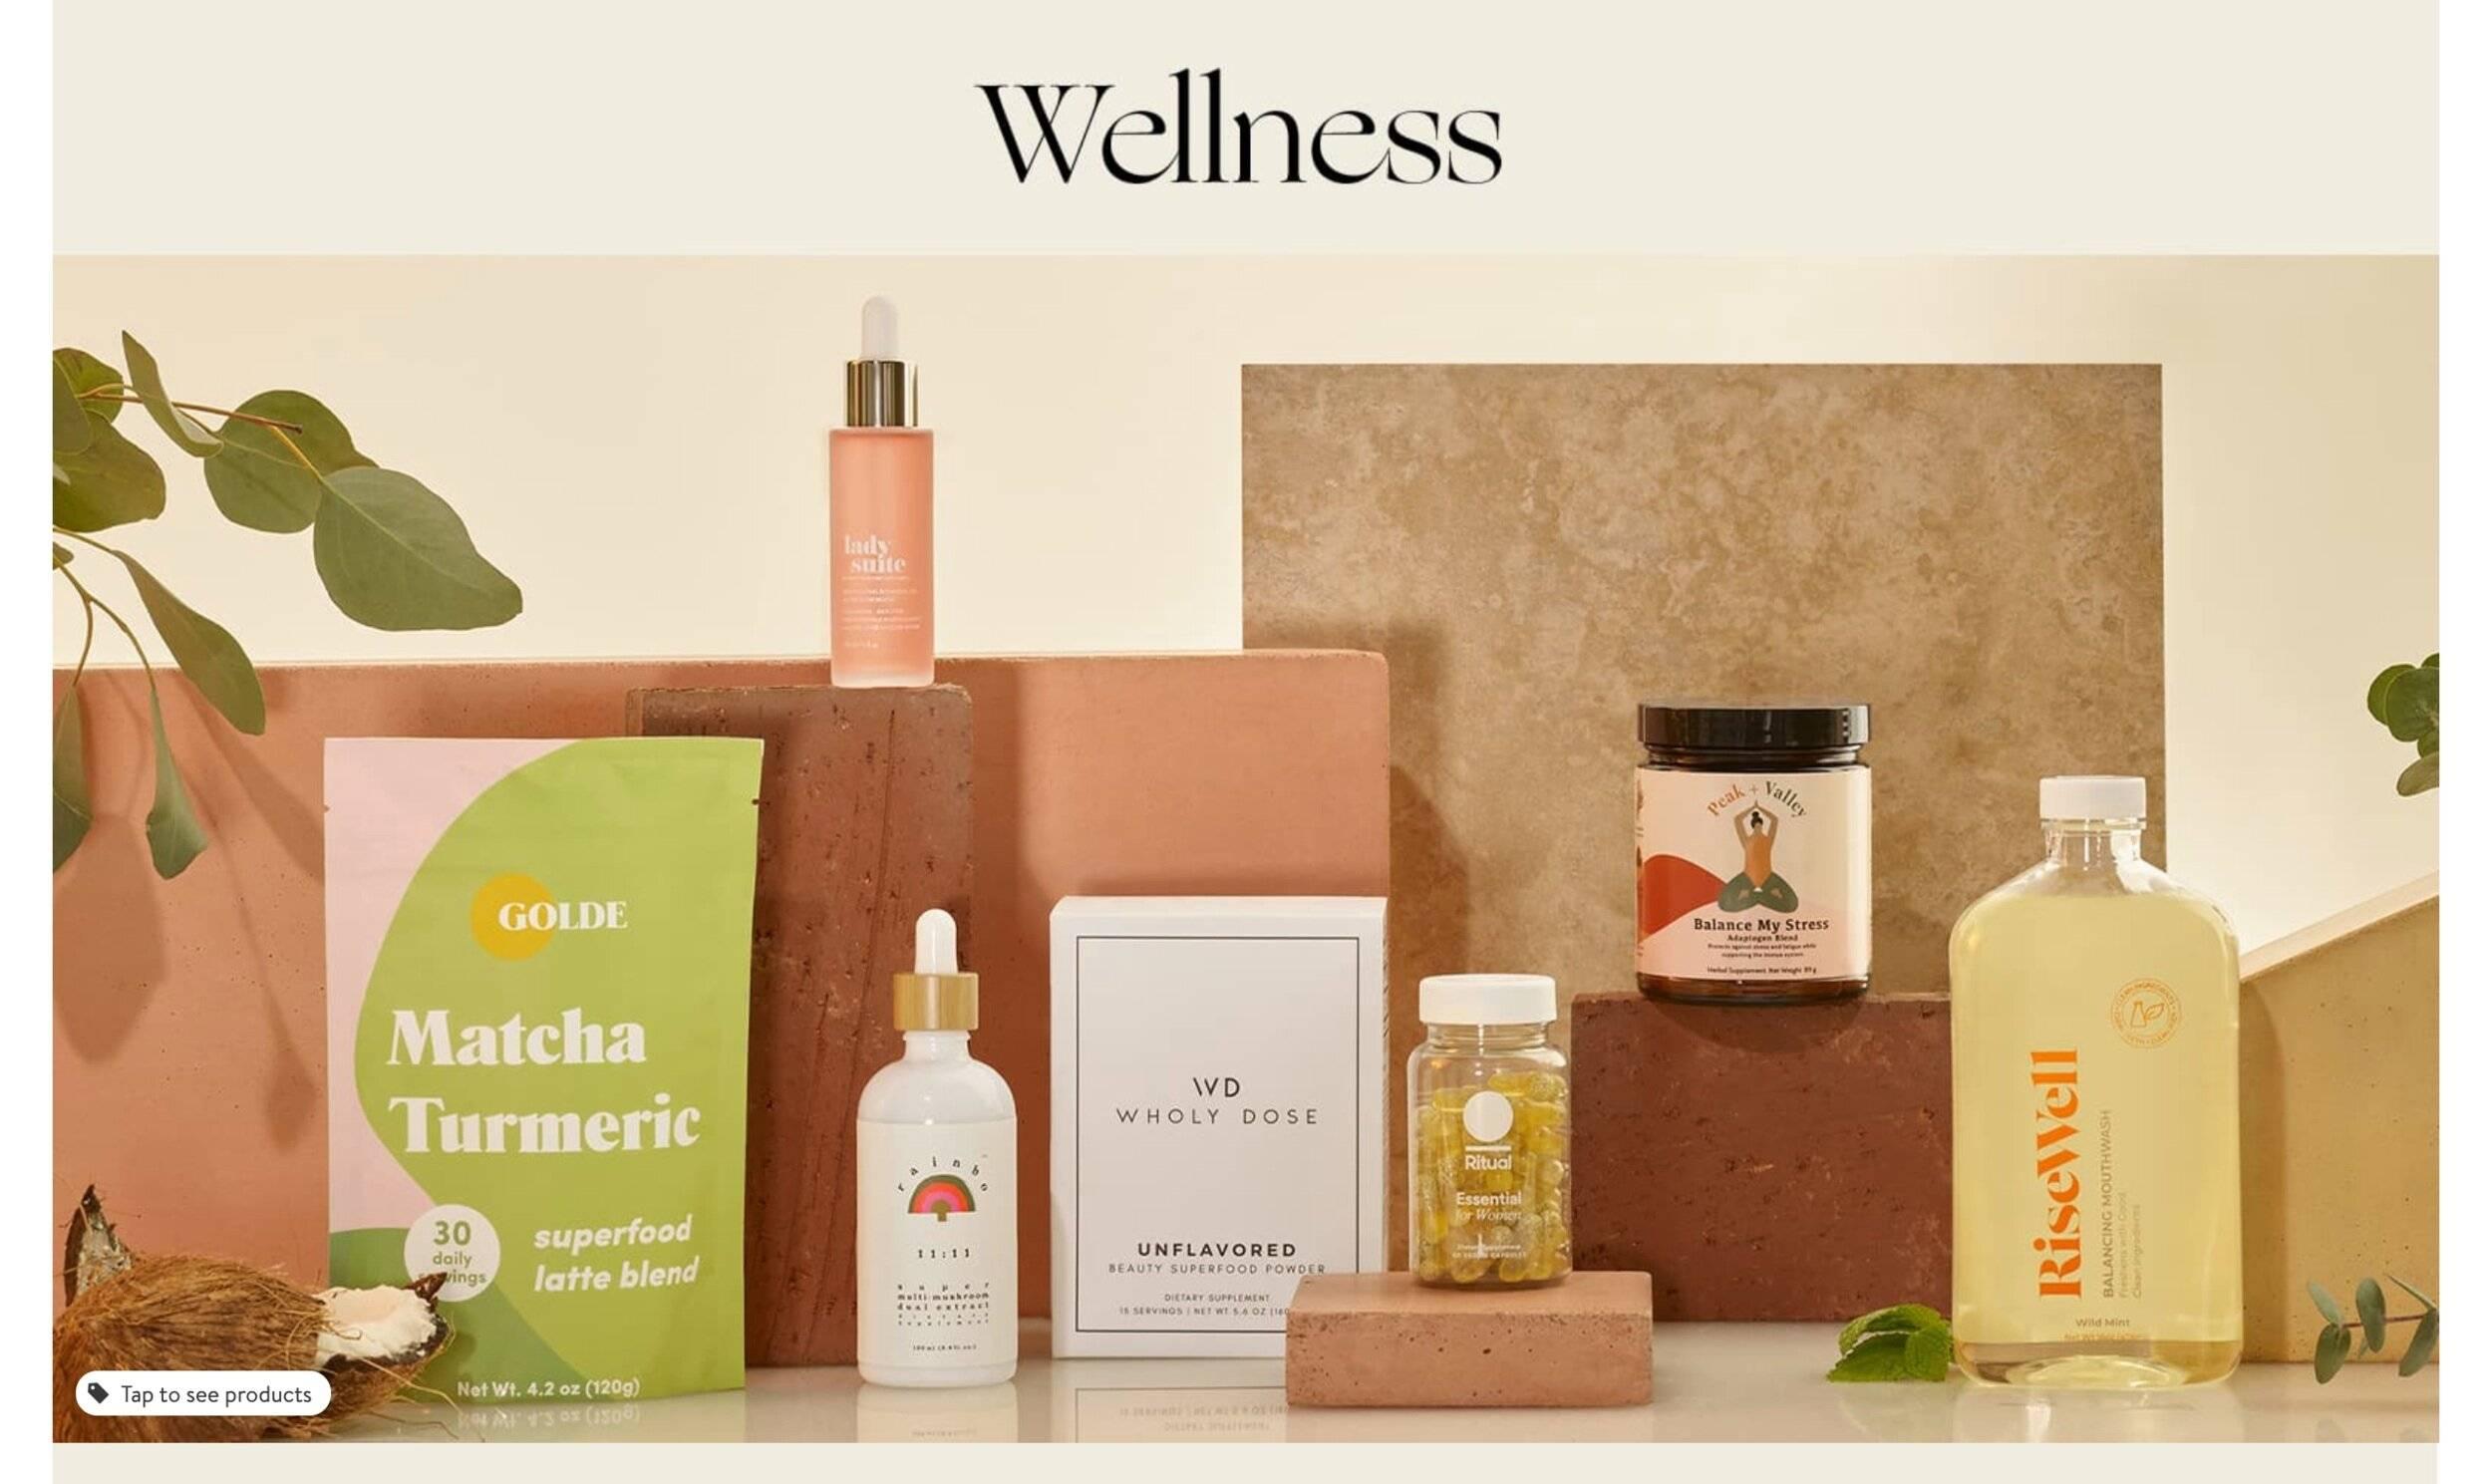 nordstrom-shop-popin-beauty-wellness-collagen-supplement-brands